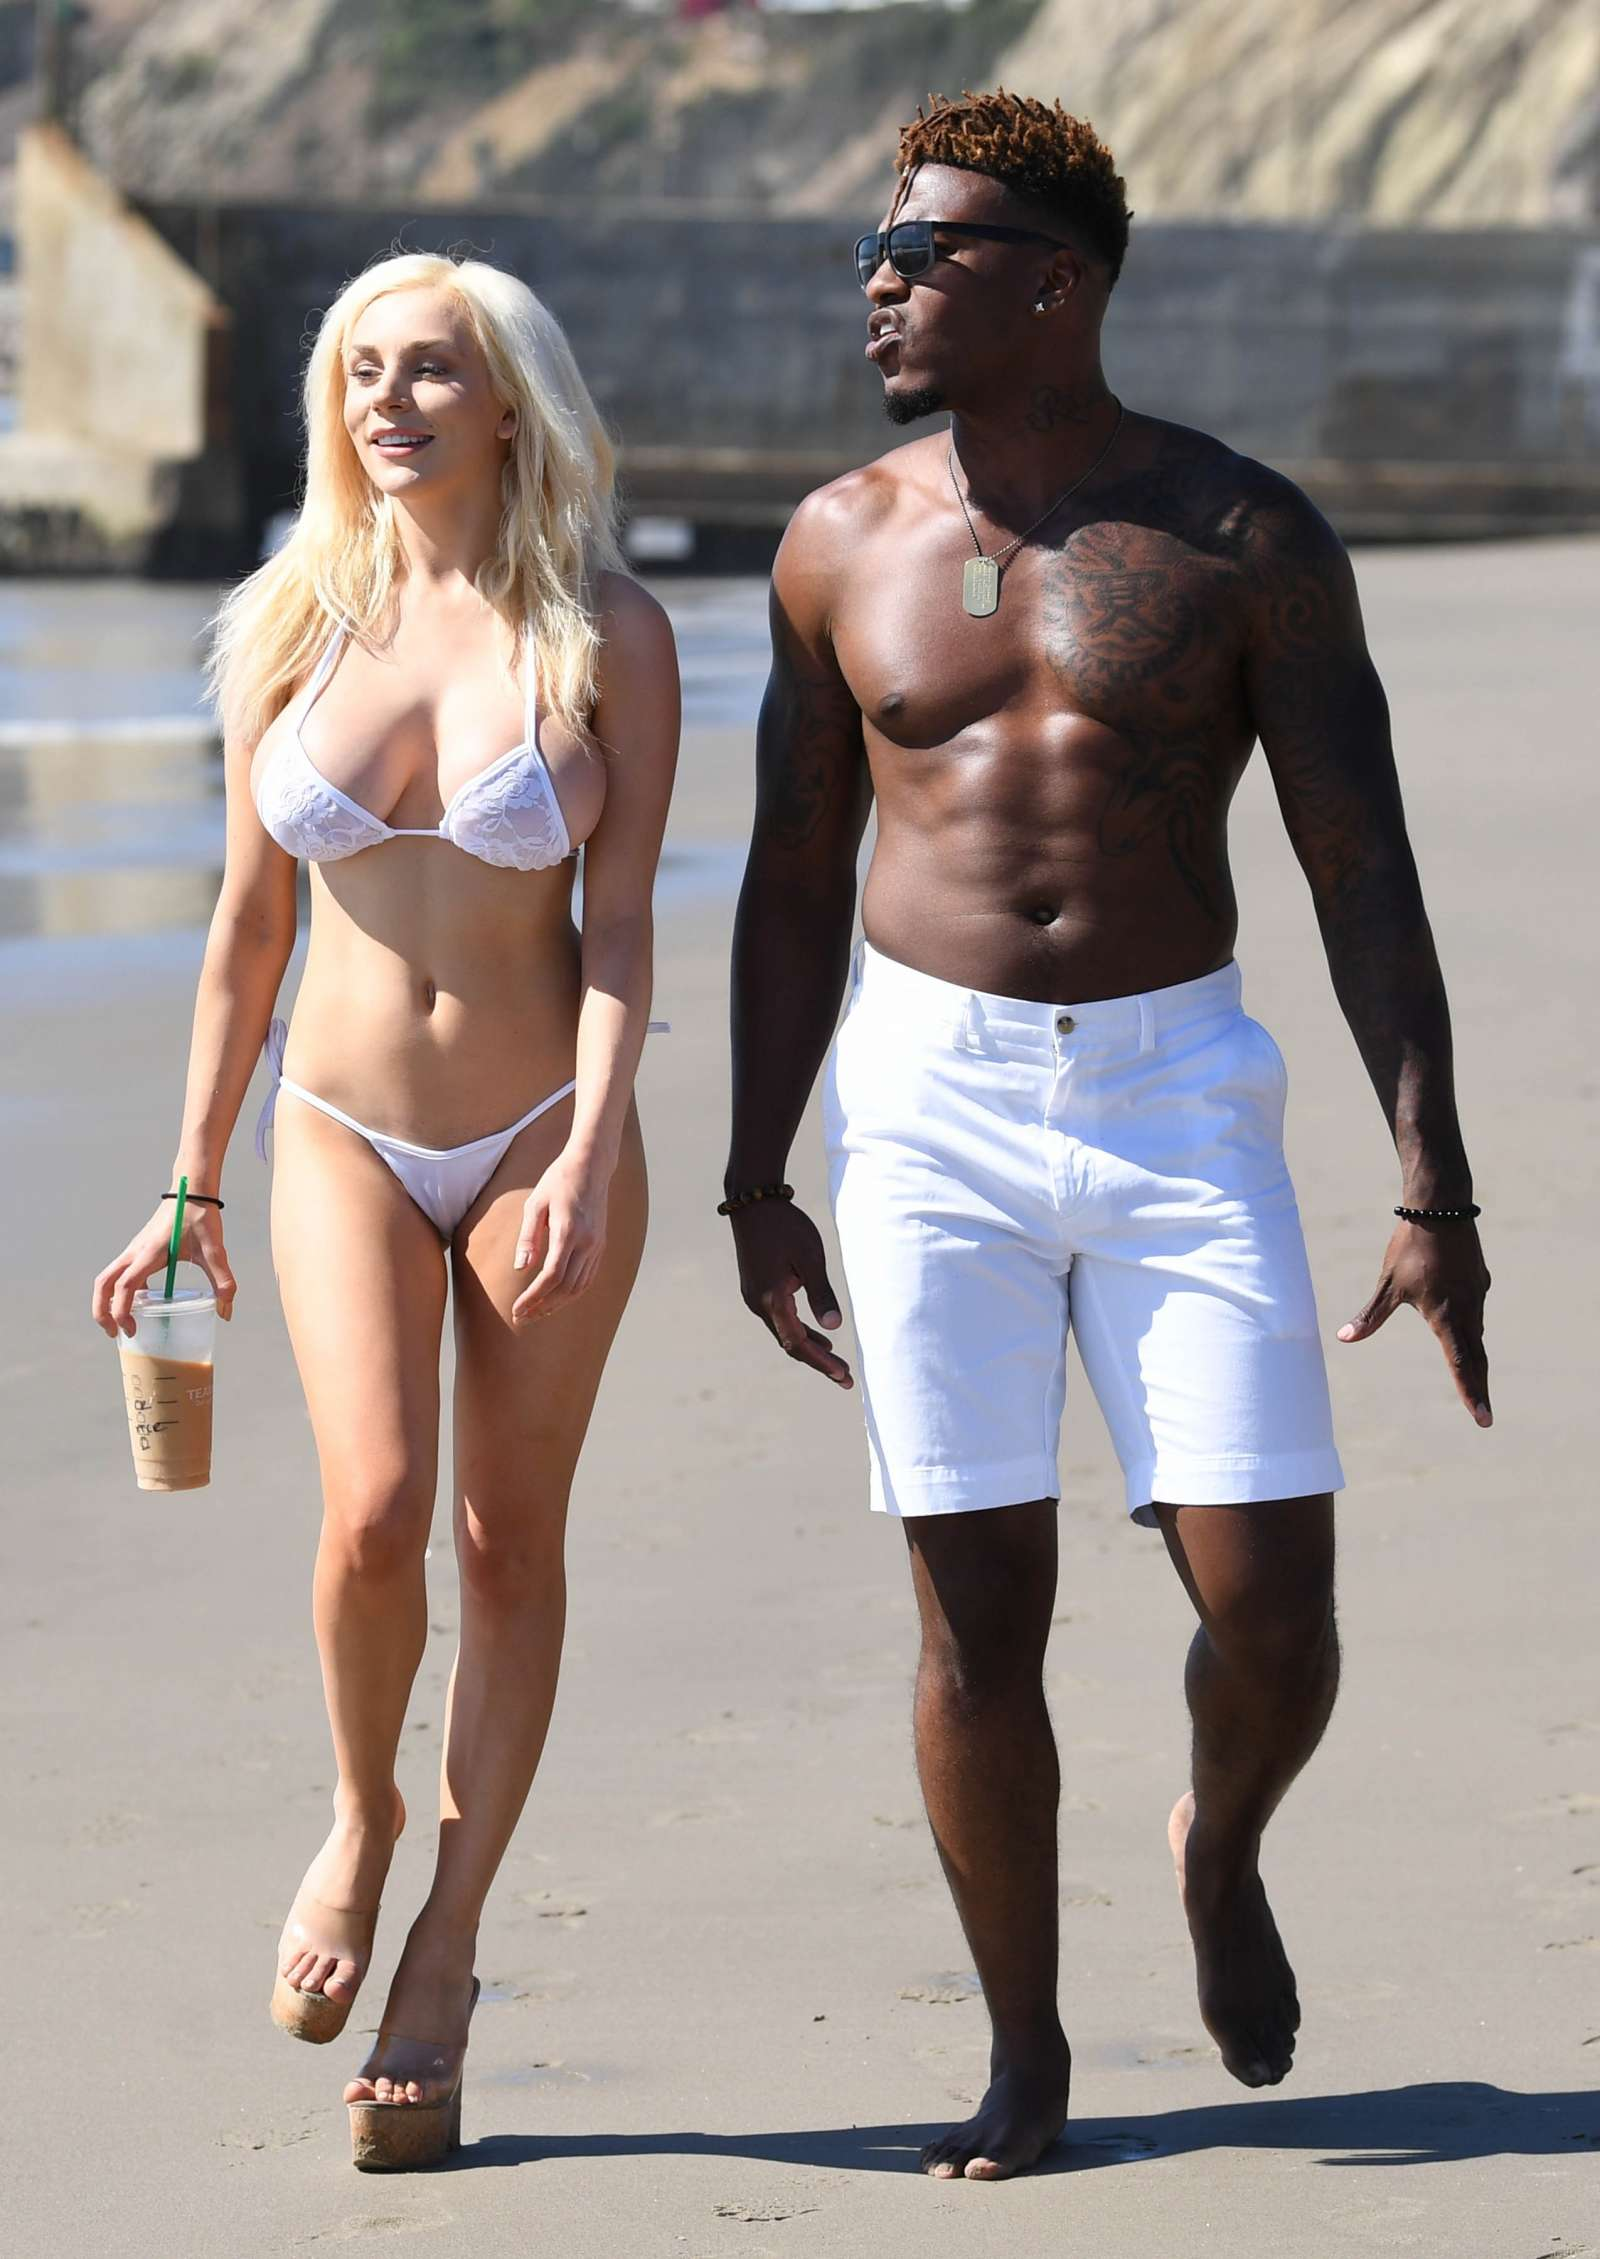 Courtney Stodden in Bikini on the beach in Malibu